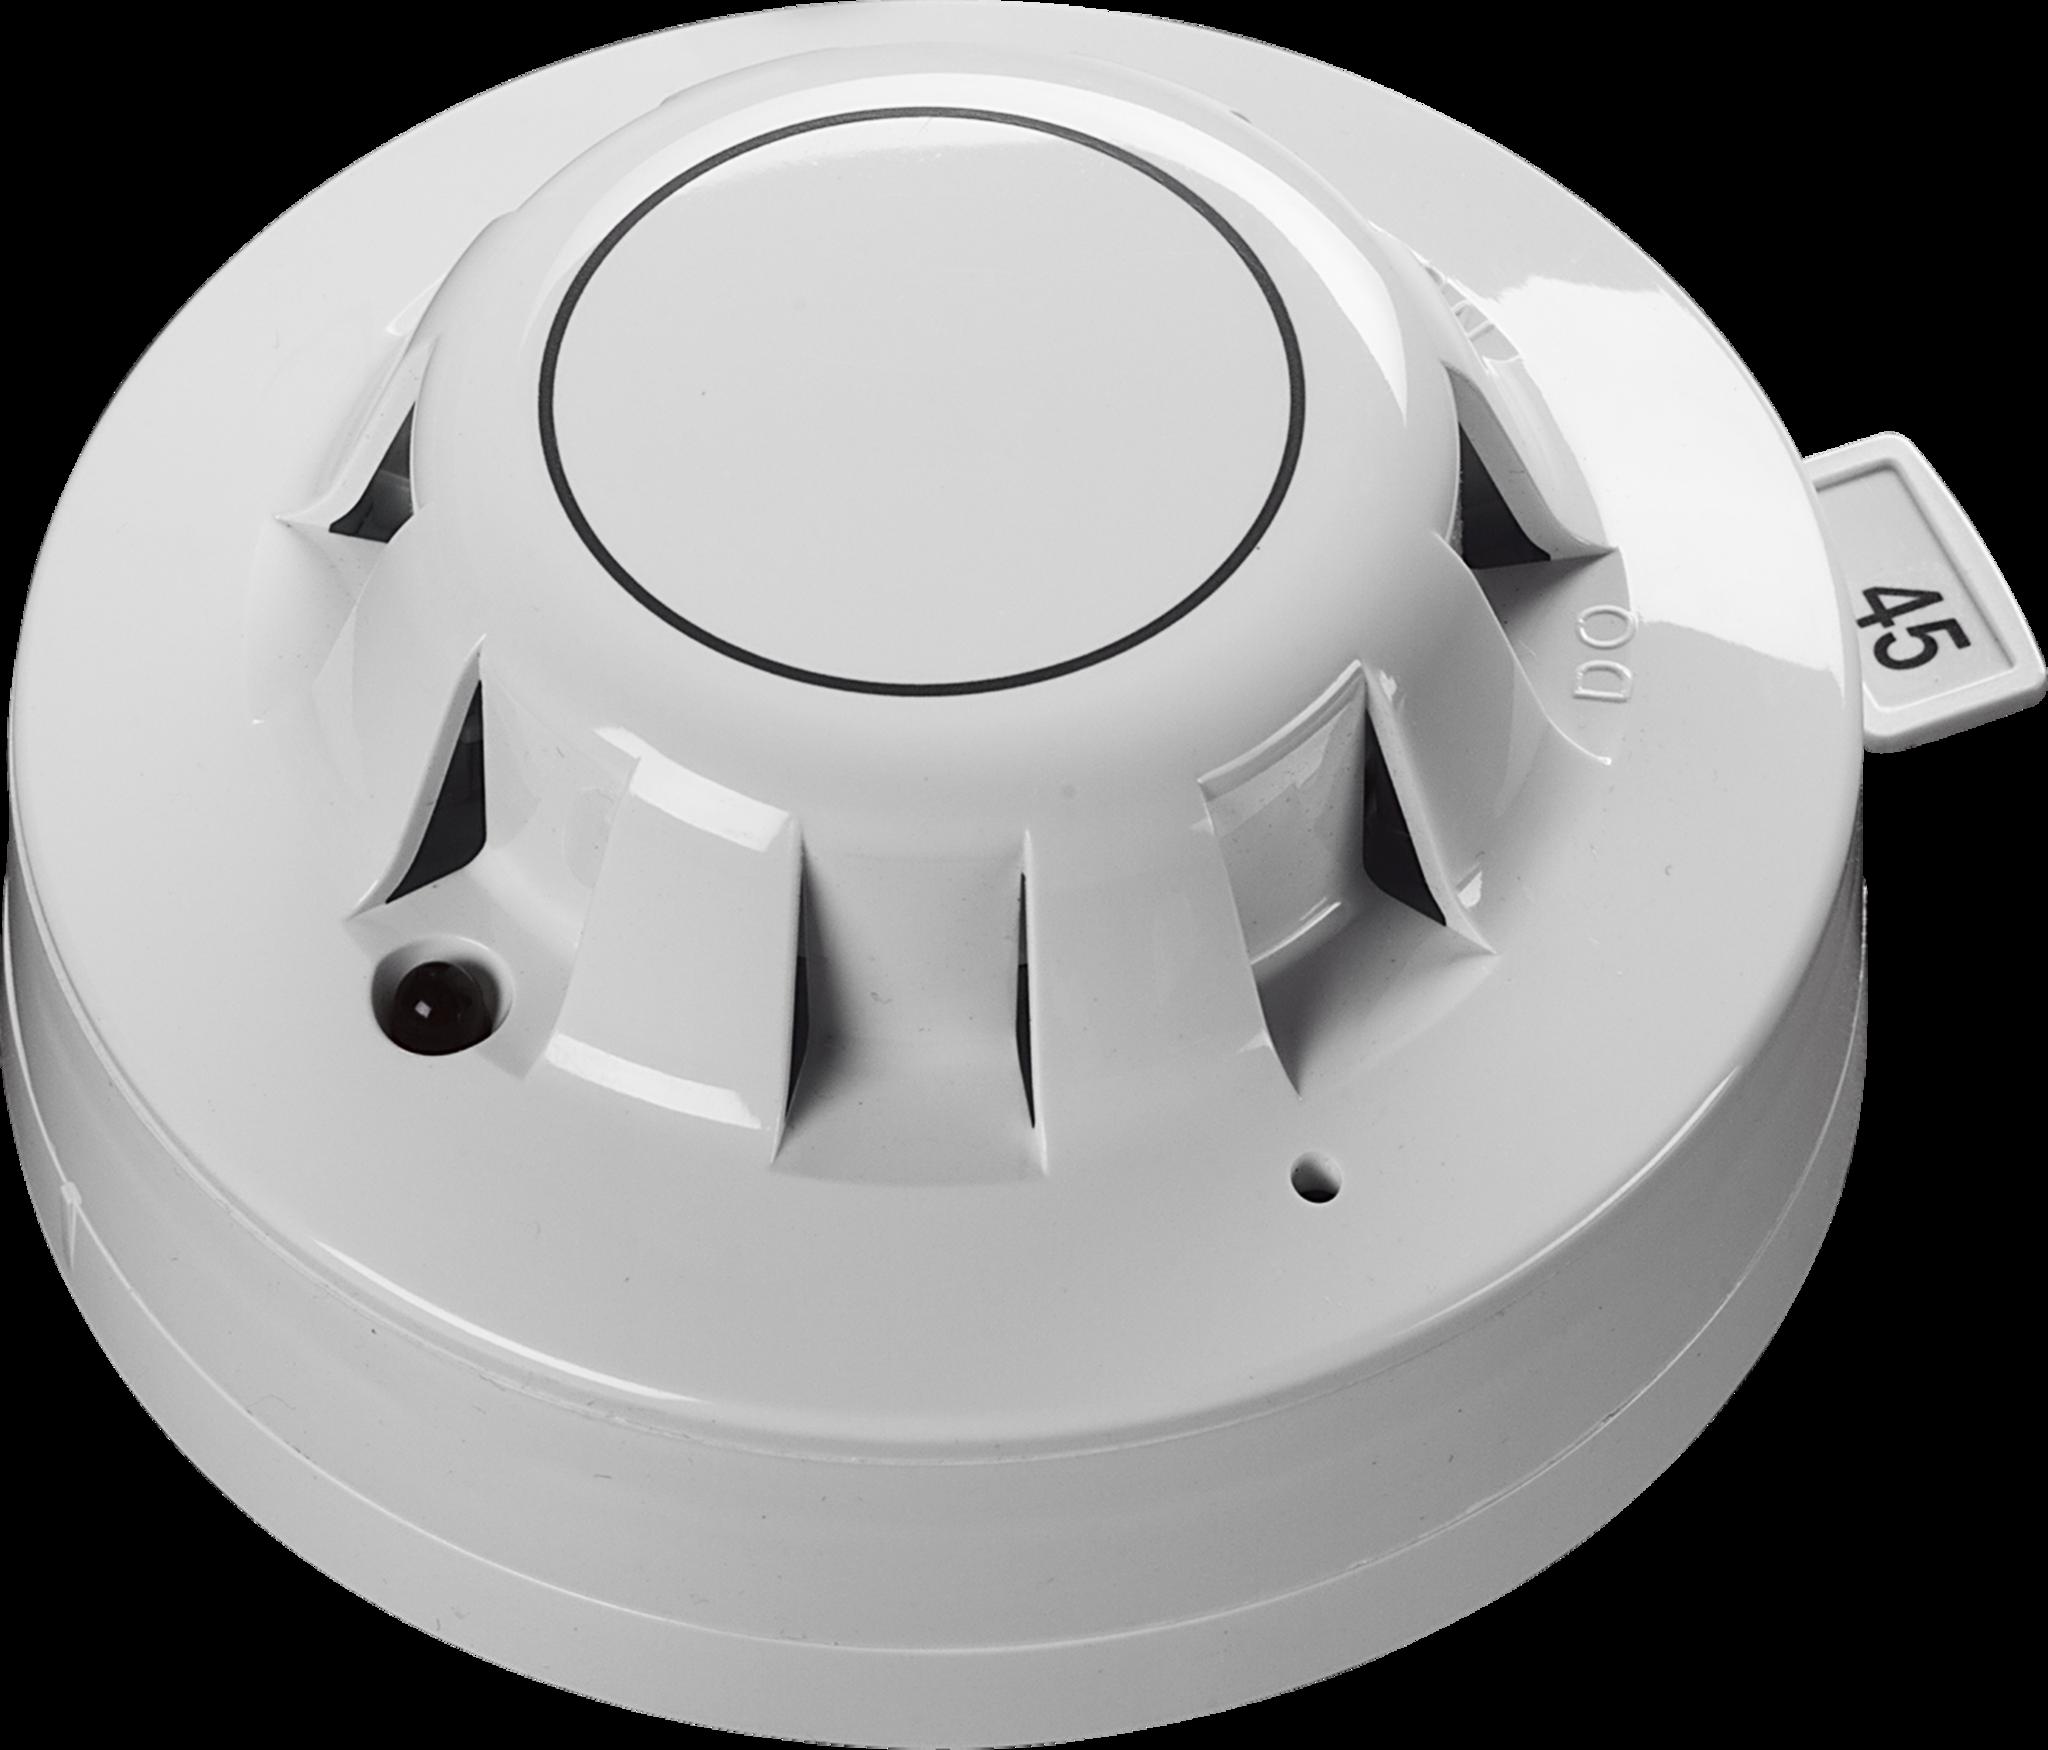 XP95 Smoke Detector